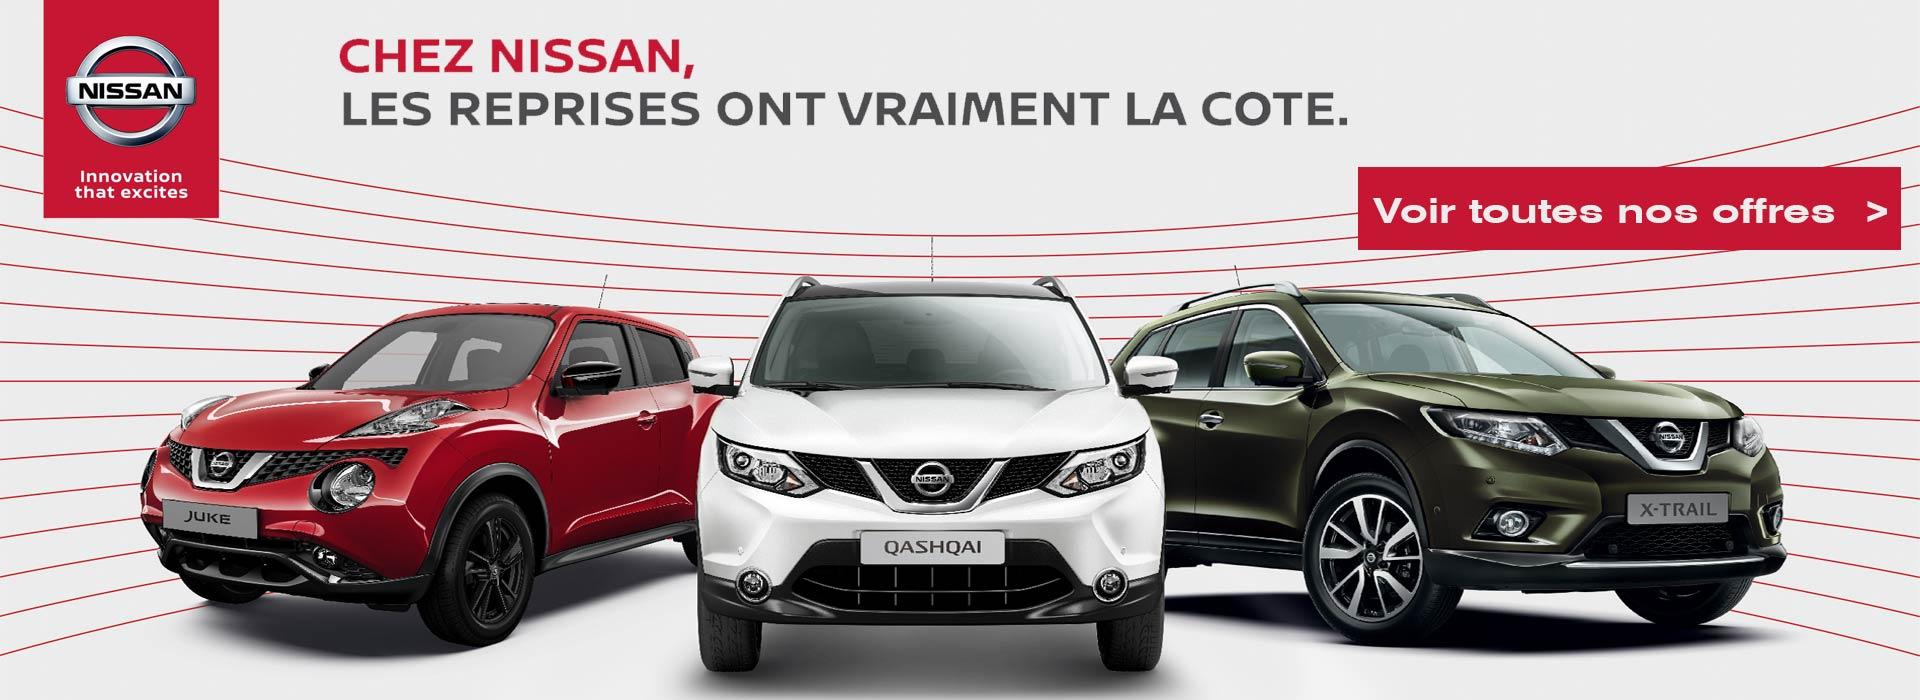 Offre Nissan